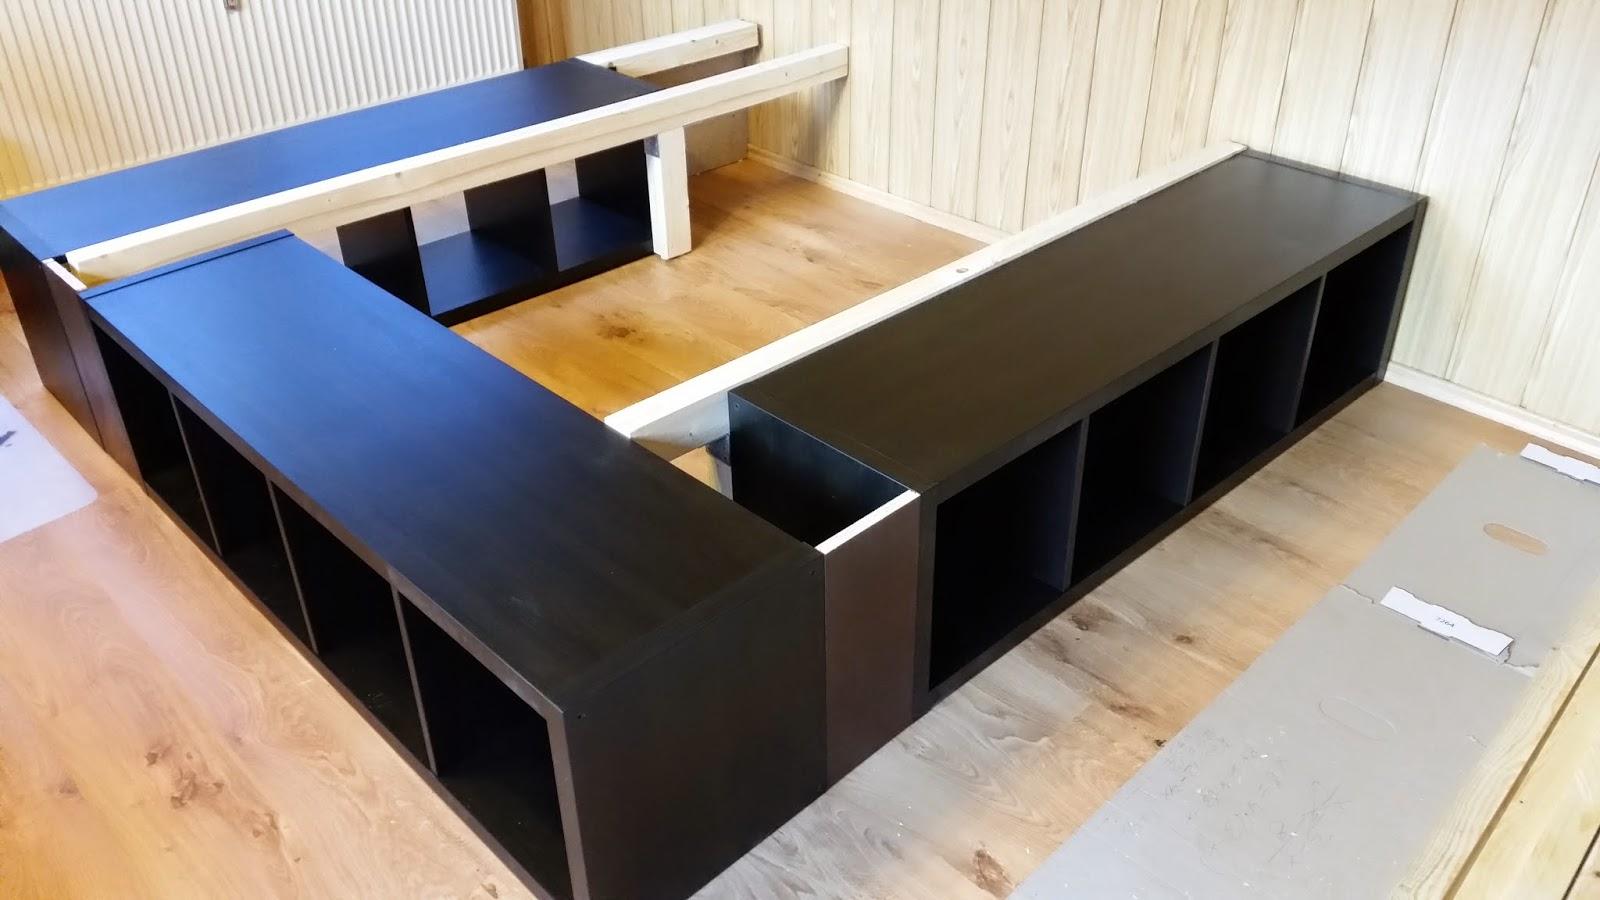 bett selber bauen ikea regal. Black Bedroom Furniture Sets. Home Design Ideas